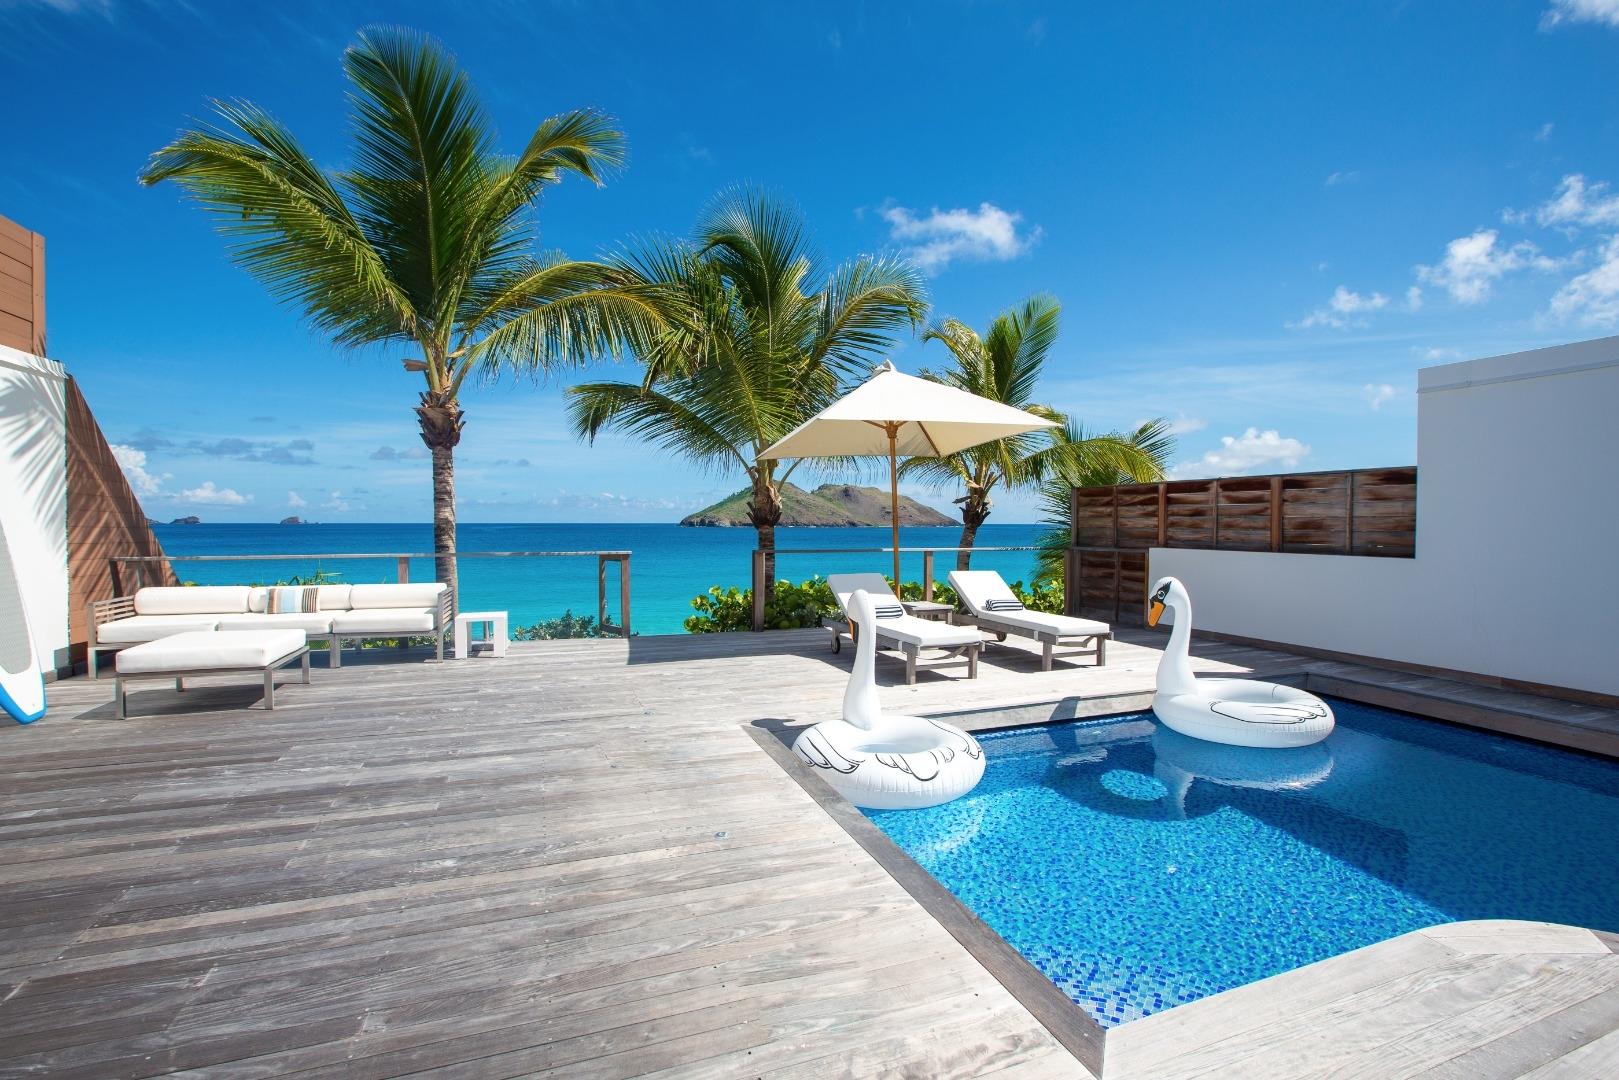 Luxury villa rentals caribbean - St barthelemy - Flamands - No location 4 - Ganesha - Image 1/19